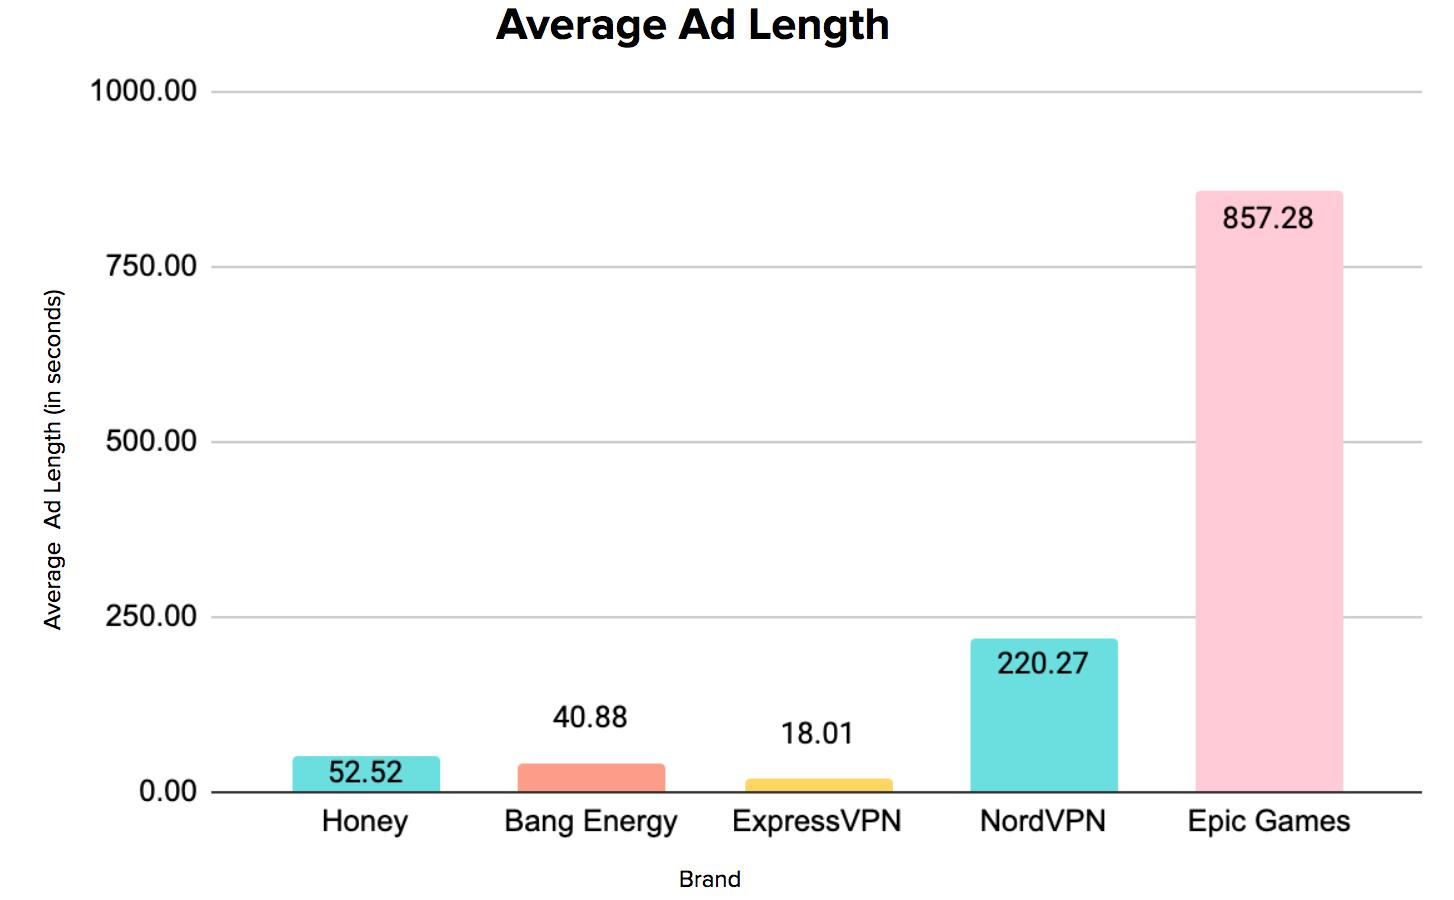 Top-Spending Brands Average Ad Length